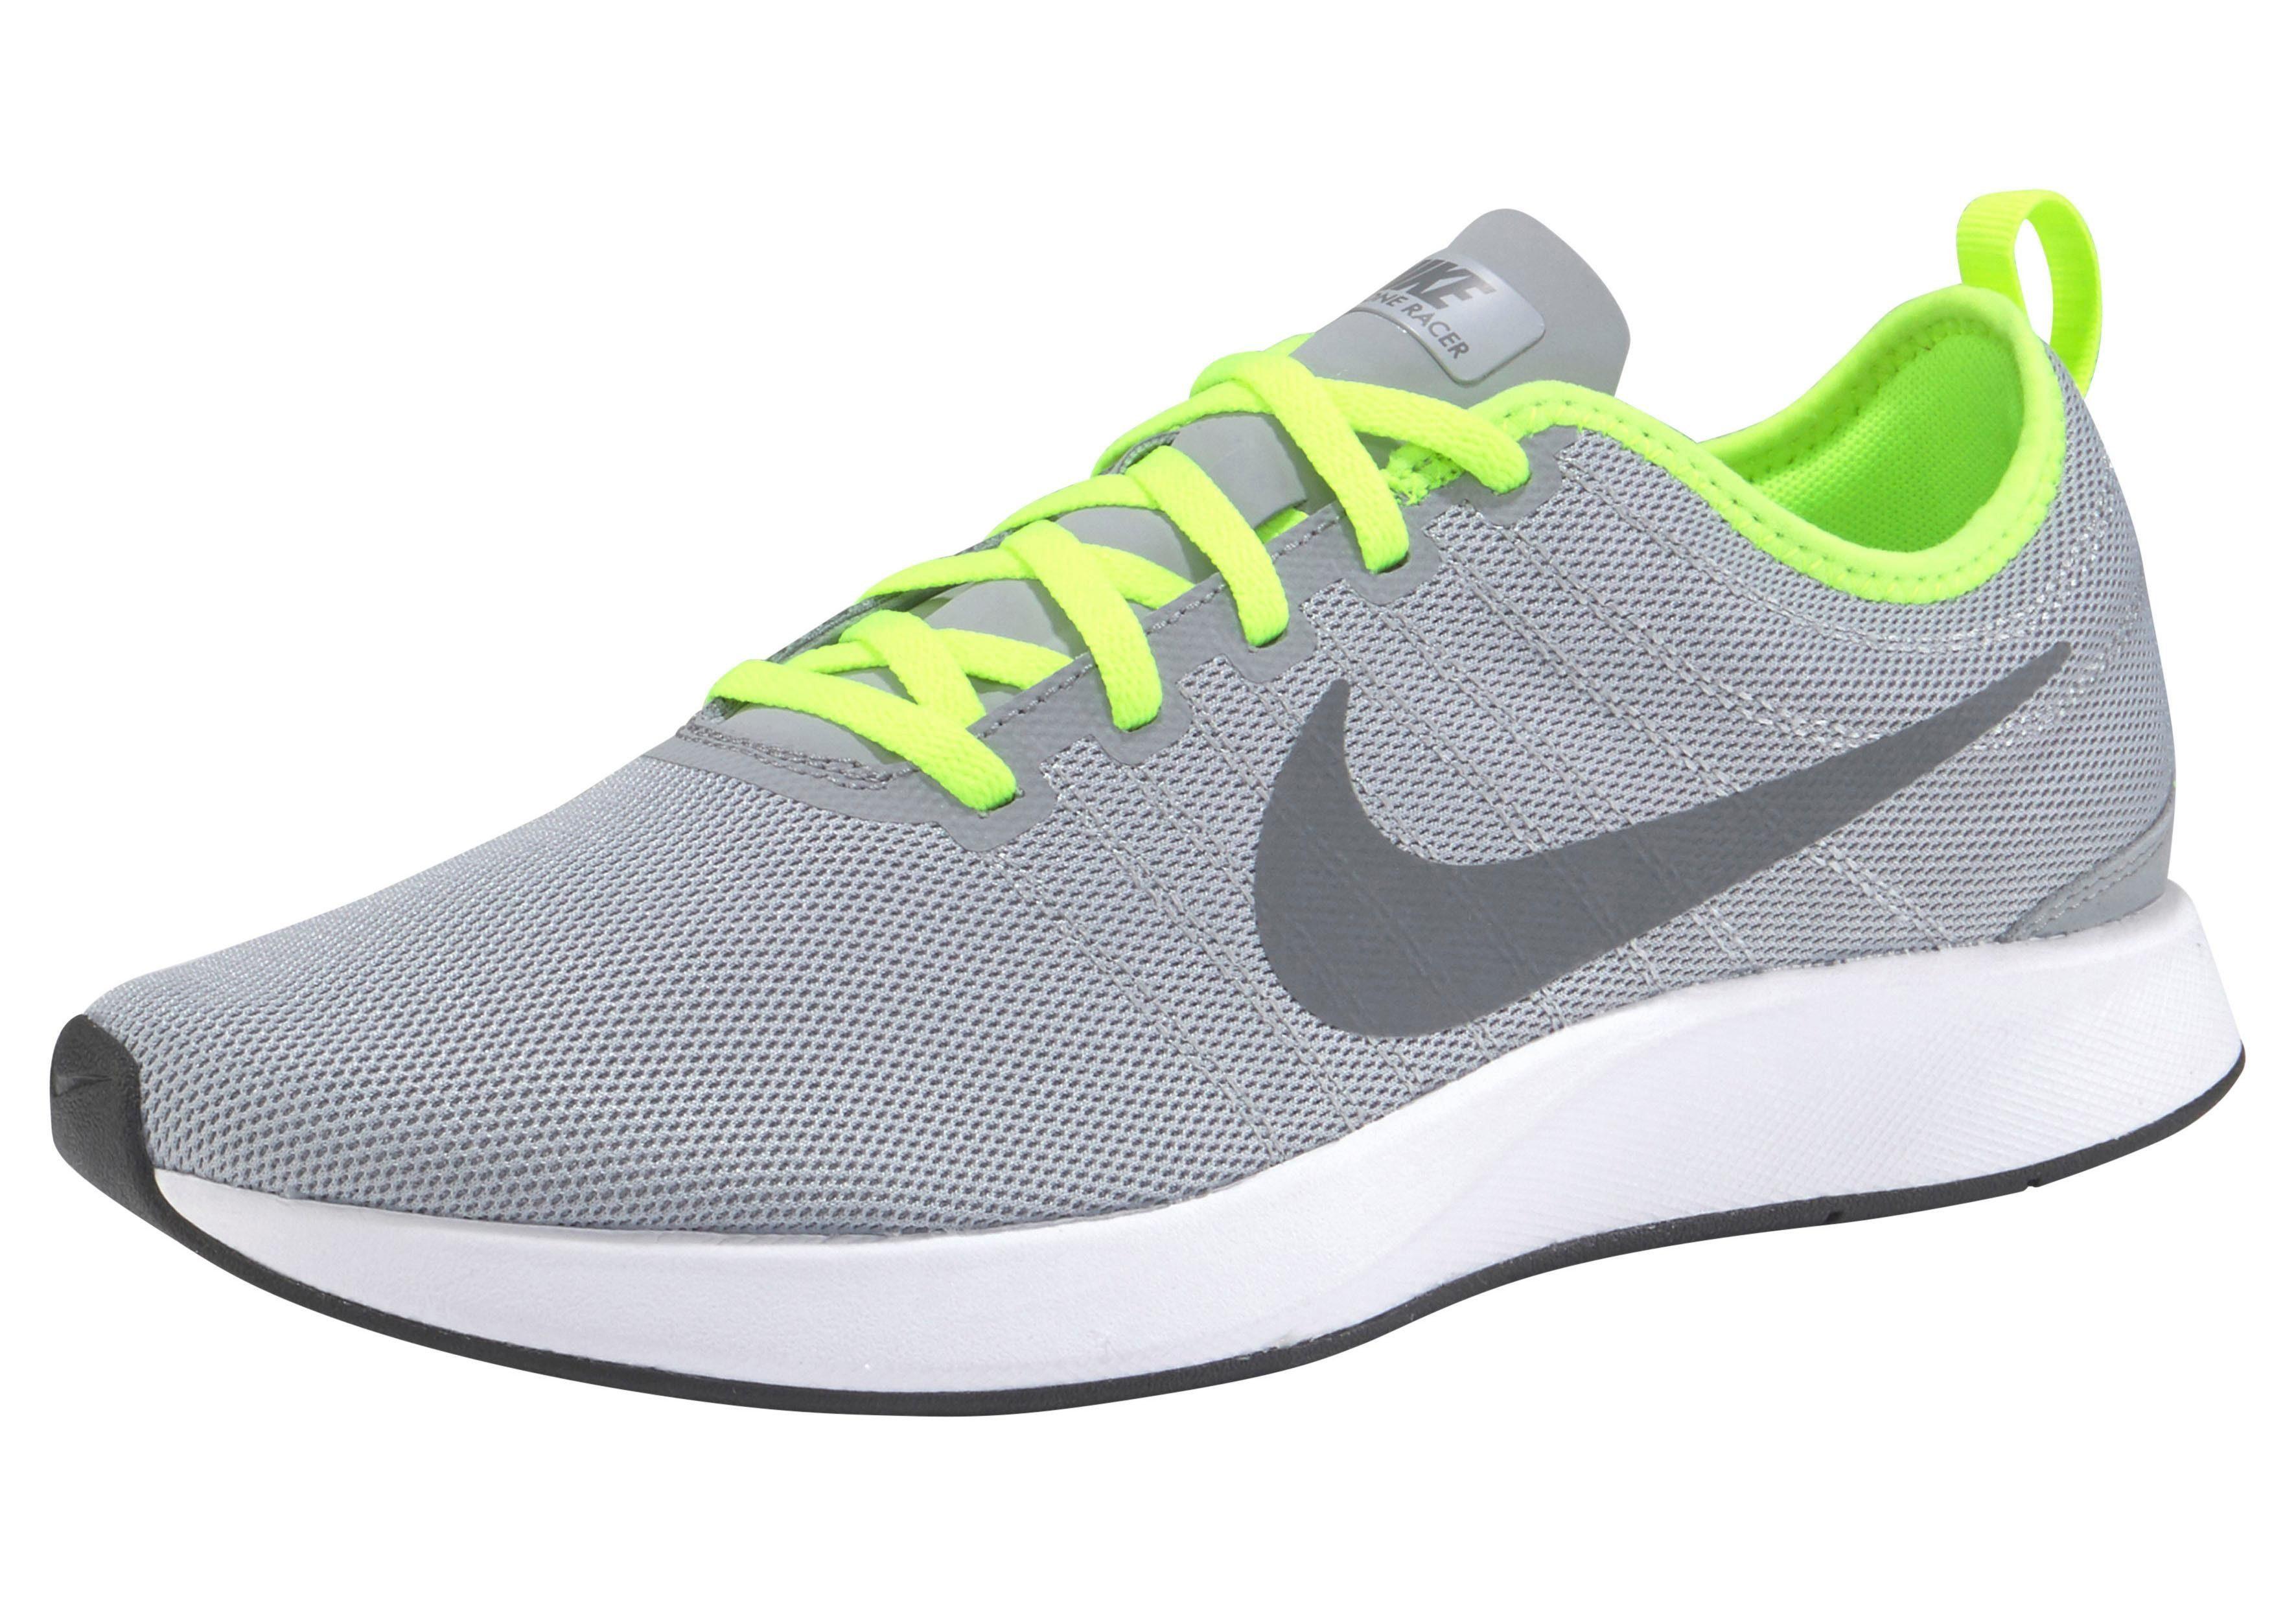 Nike Sportswear »Dualtone Racer« Sneaker, Atmungsaktives Obermaterial aus Textil online kaufen   OTTO